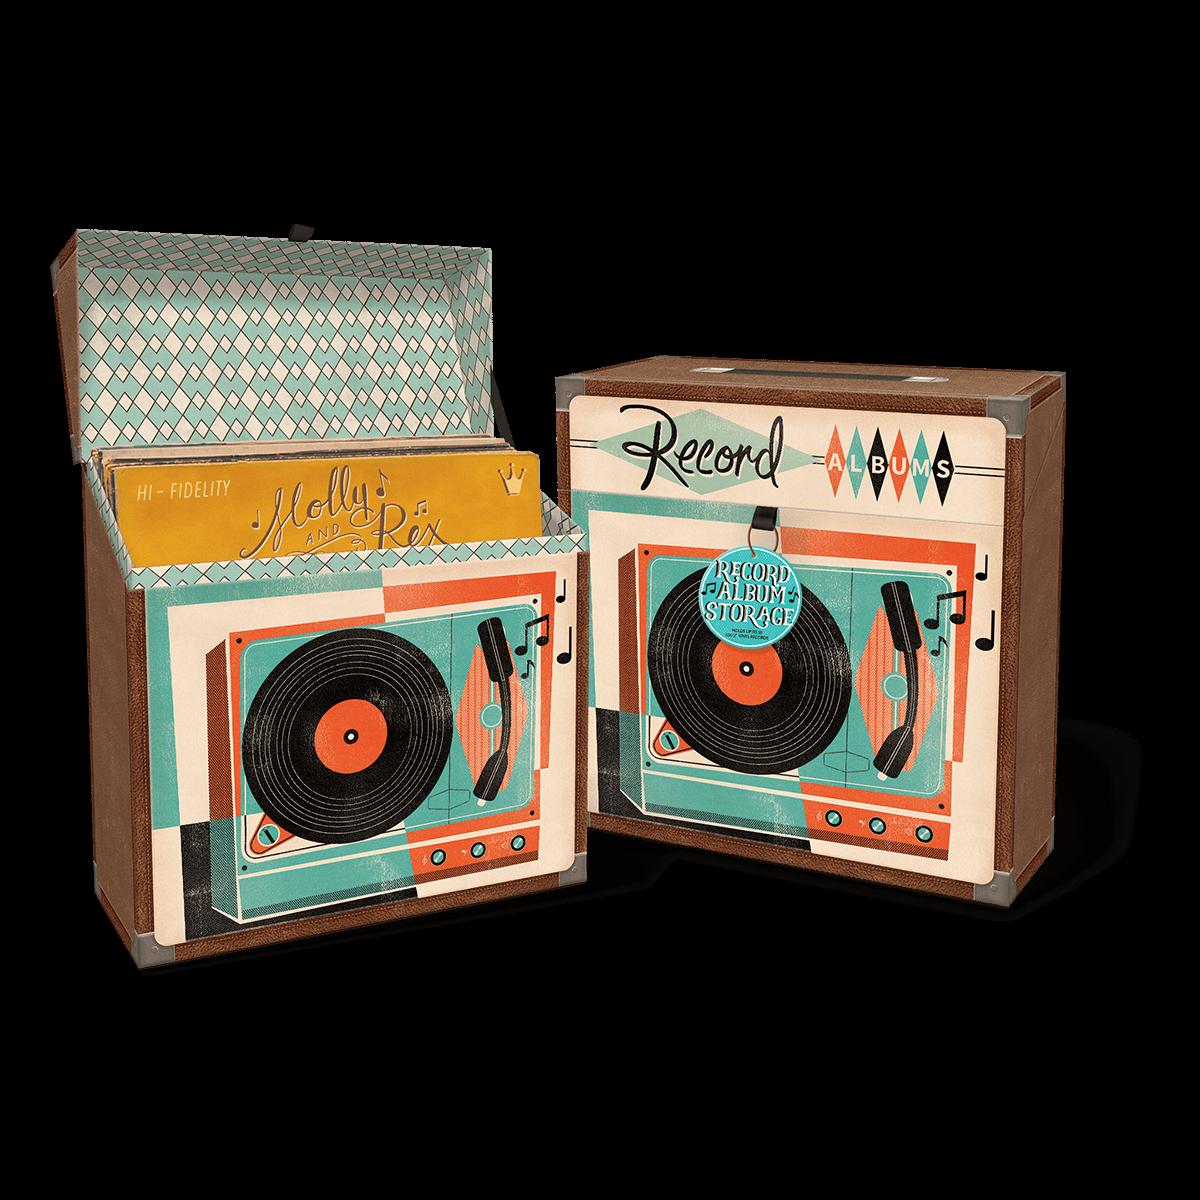 Yesteryear Record Album Storage Box